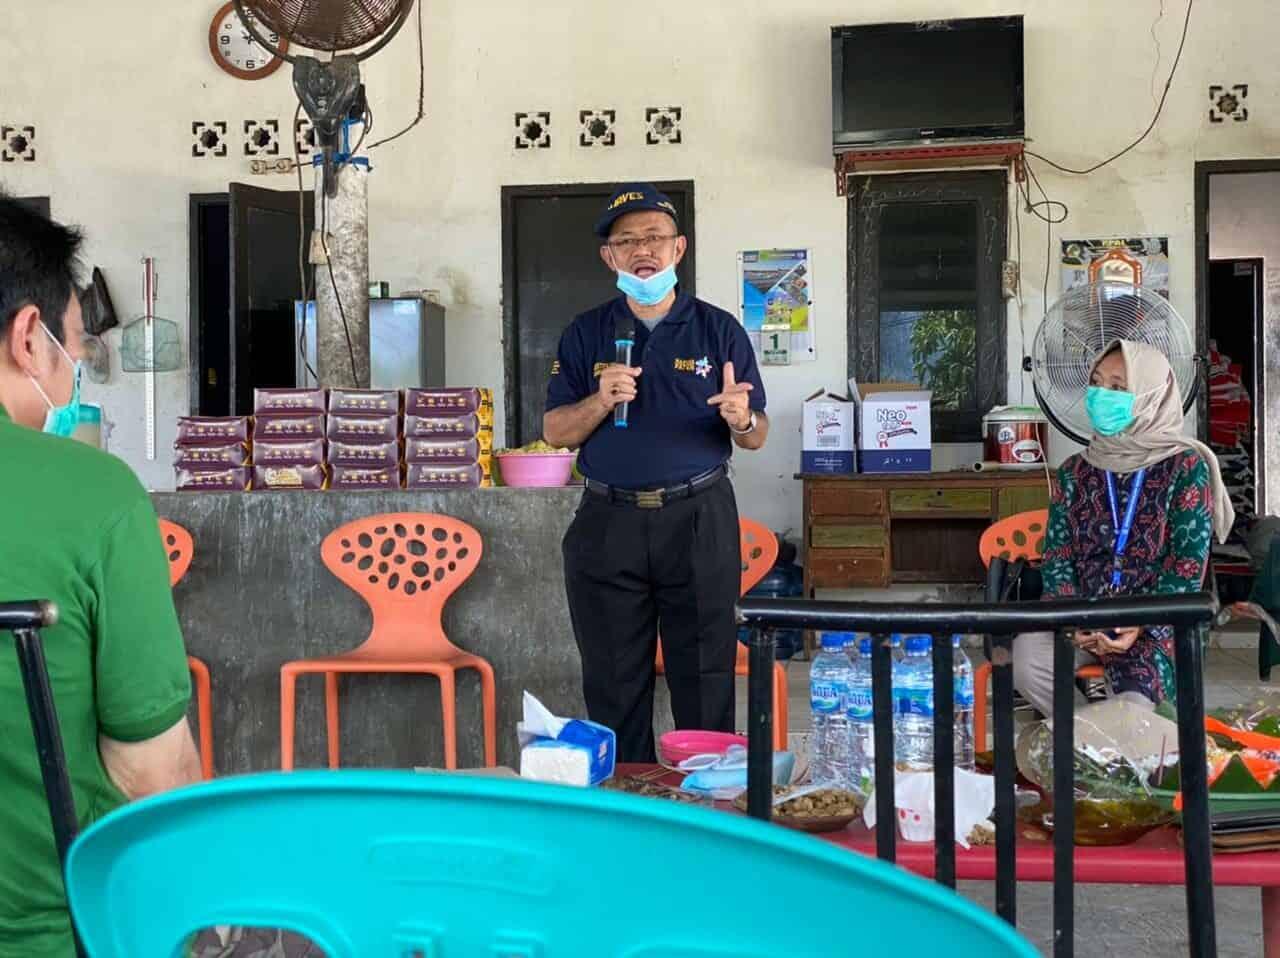 Kuatkan Sinergitas Penguatan Daya Saing Produk Kelautan dan Perikanan, Kemenko Marves Gelar Rakor dengan Kementerian dan Lembaga Terkait